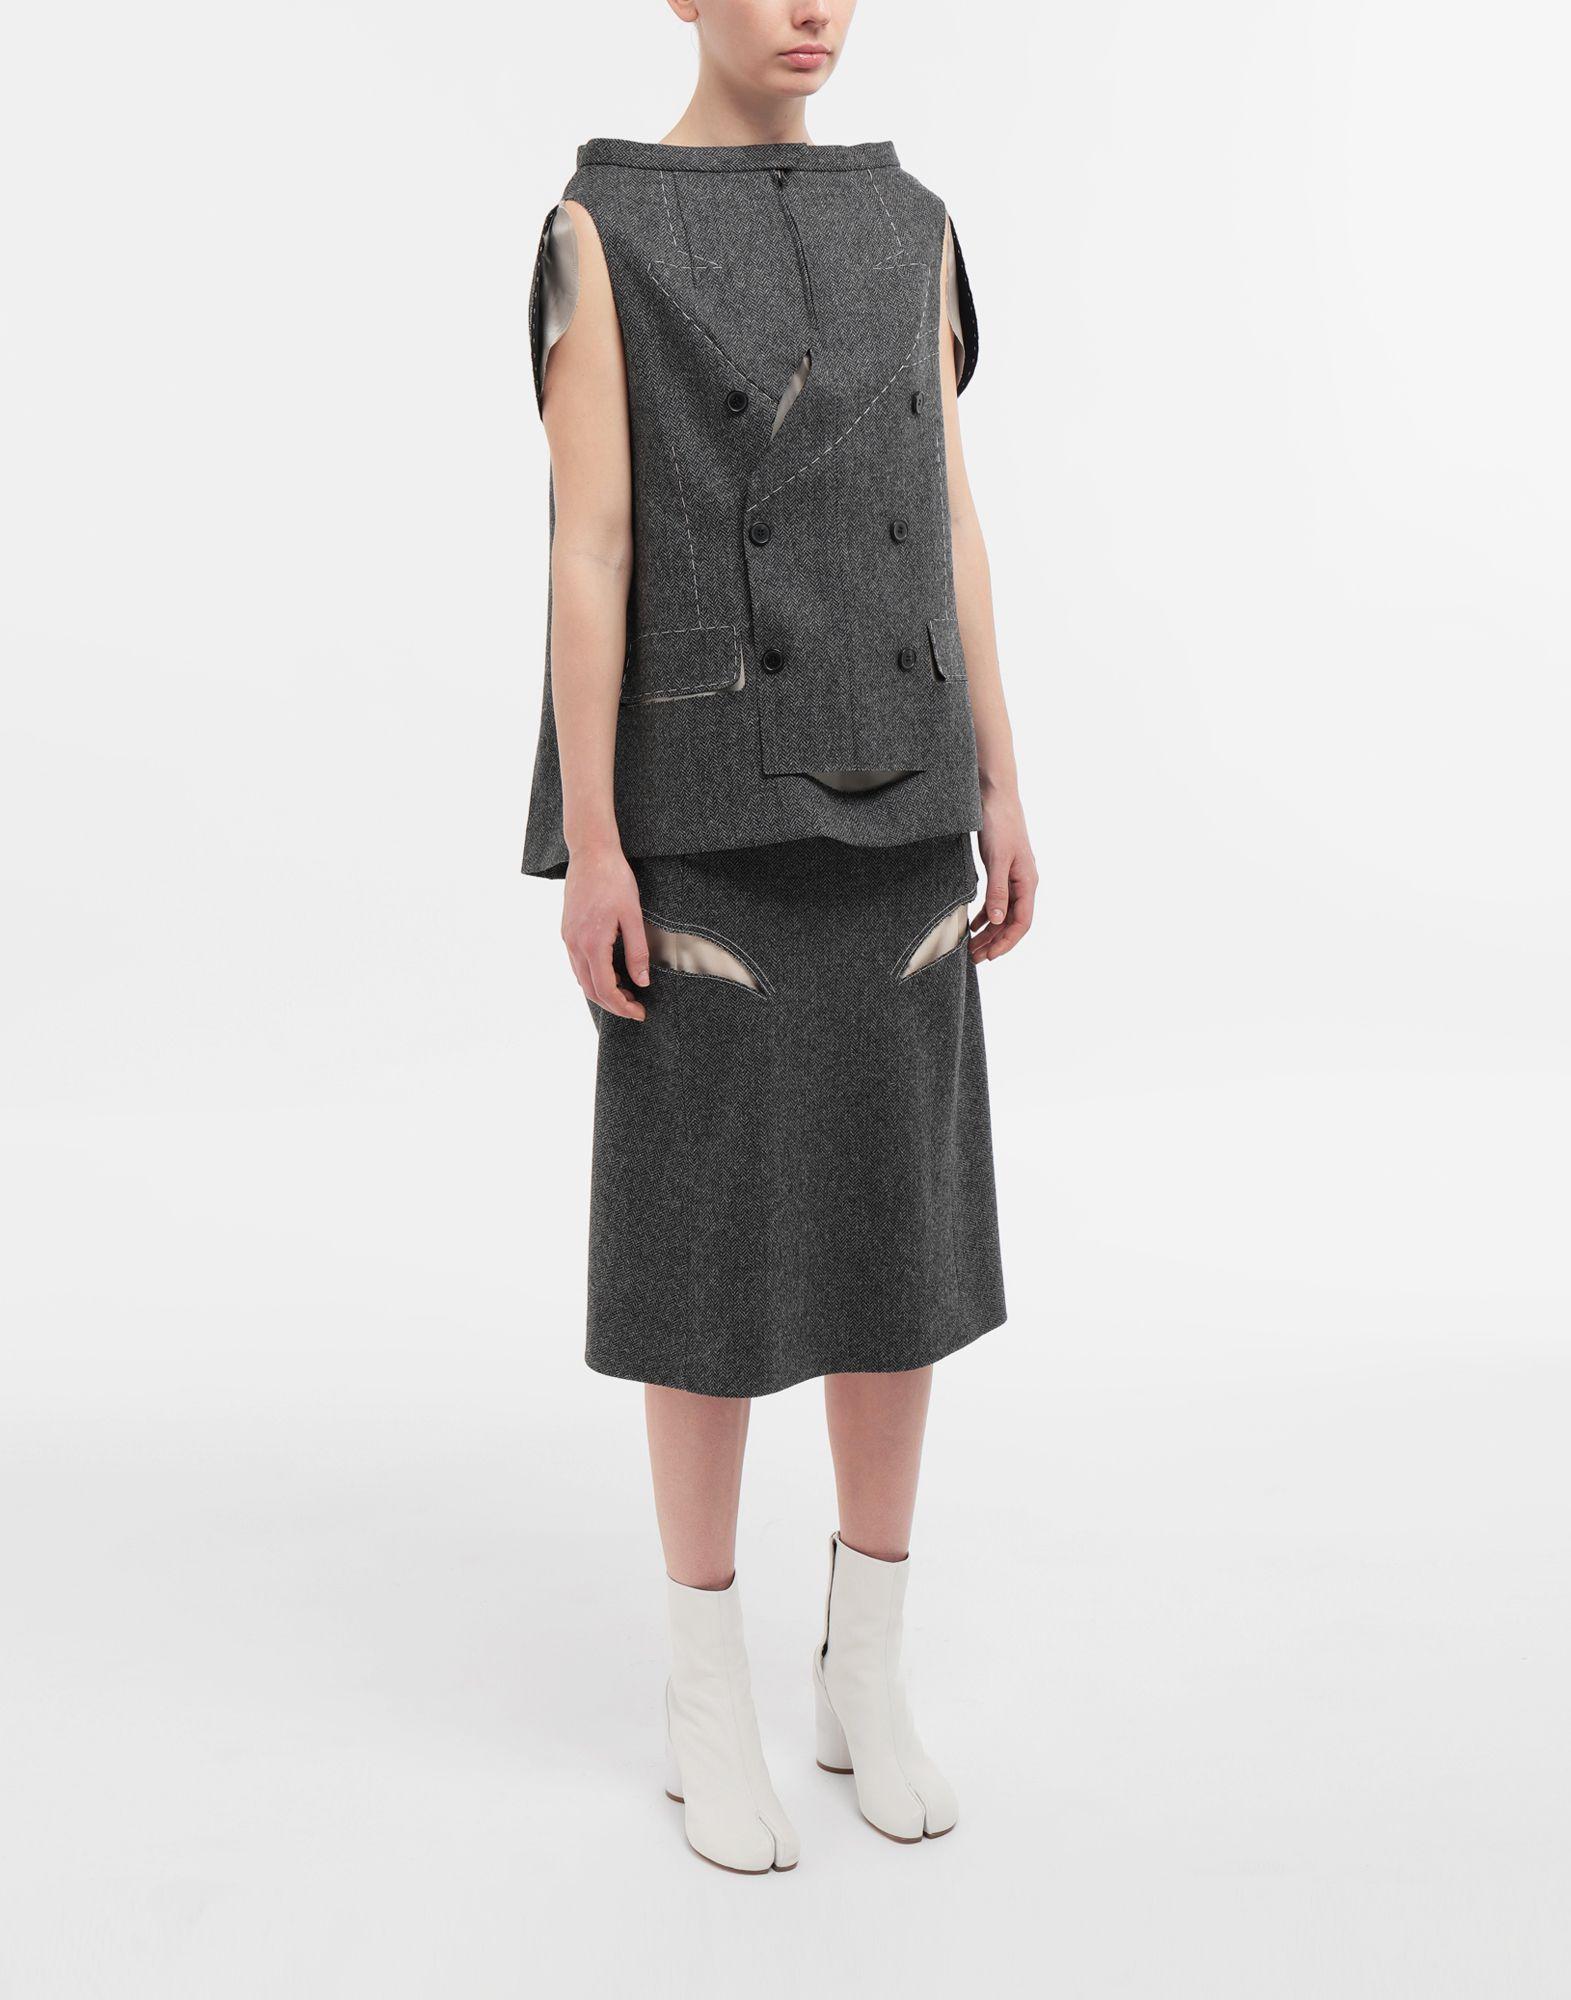 MAISON MARGIELA Tailored skirt cape top Top Woman d